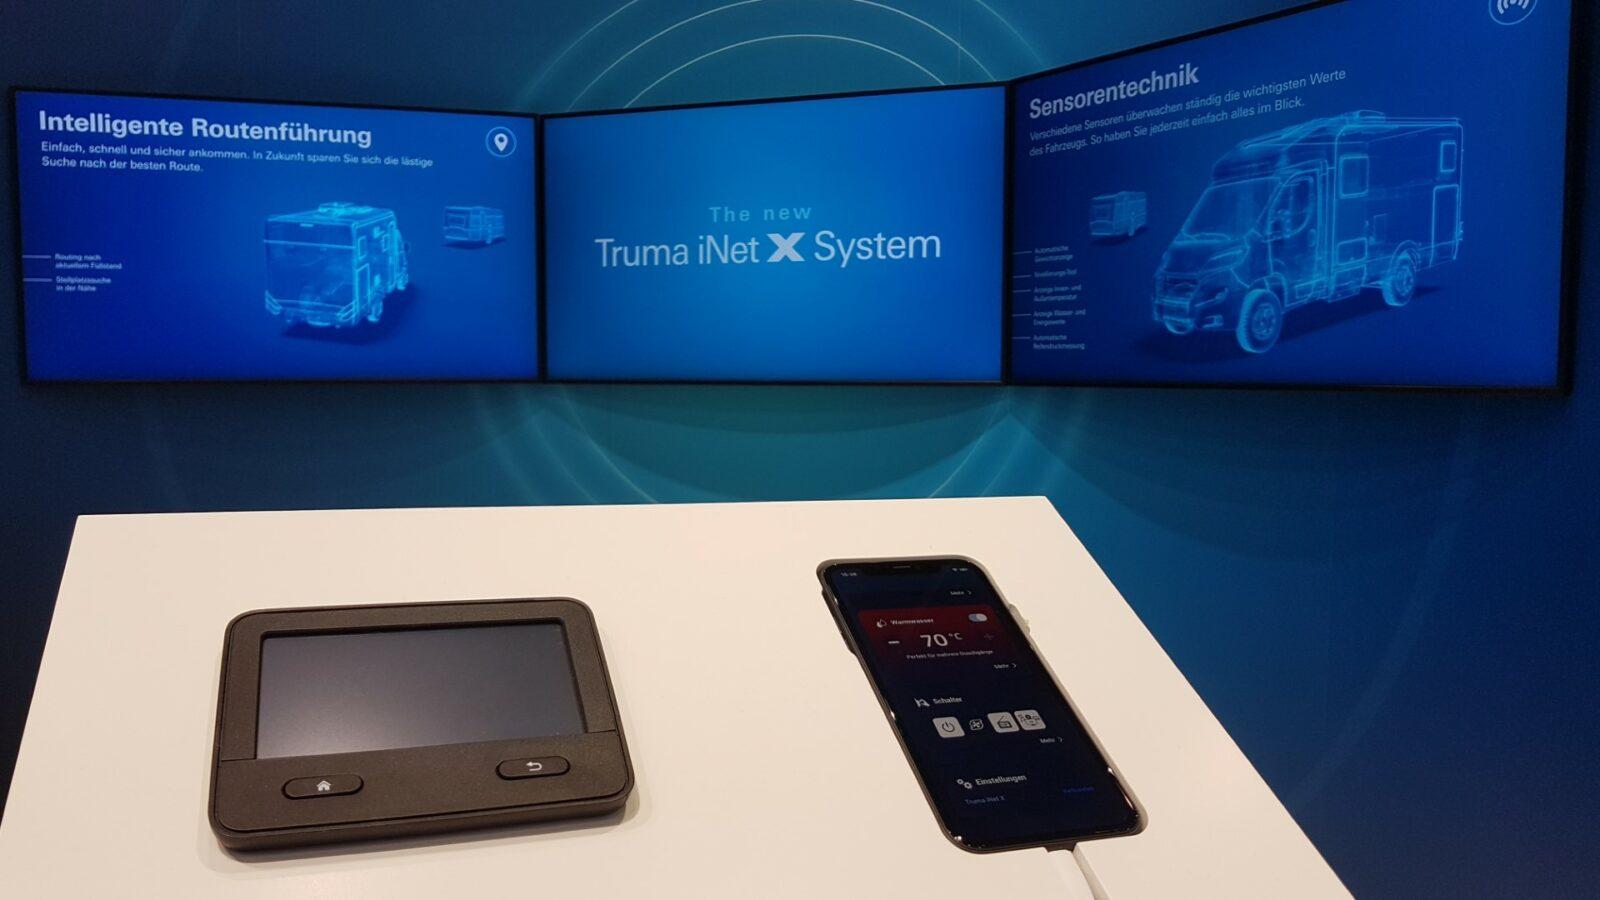 CSD smarte Caravan-Steuerung Truma iNet X